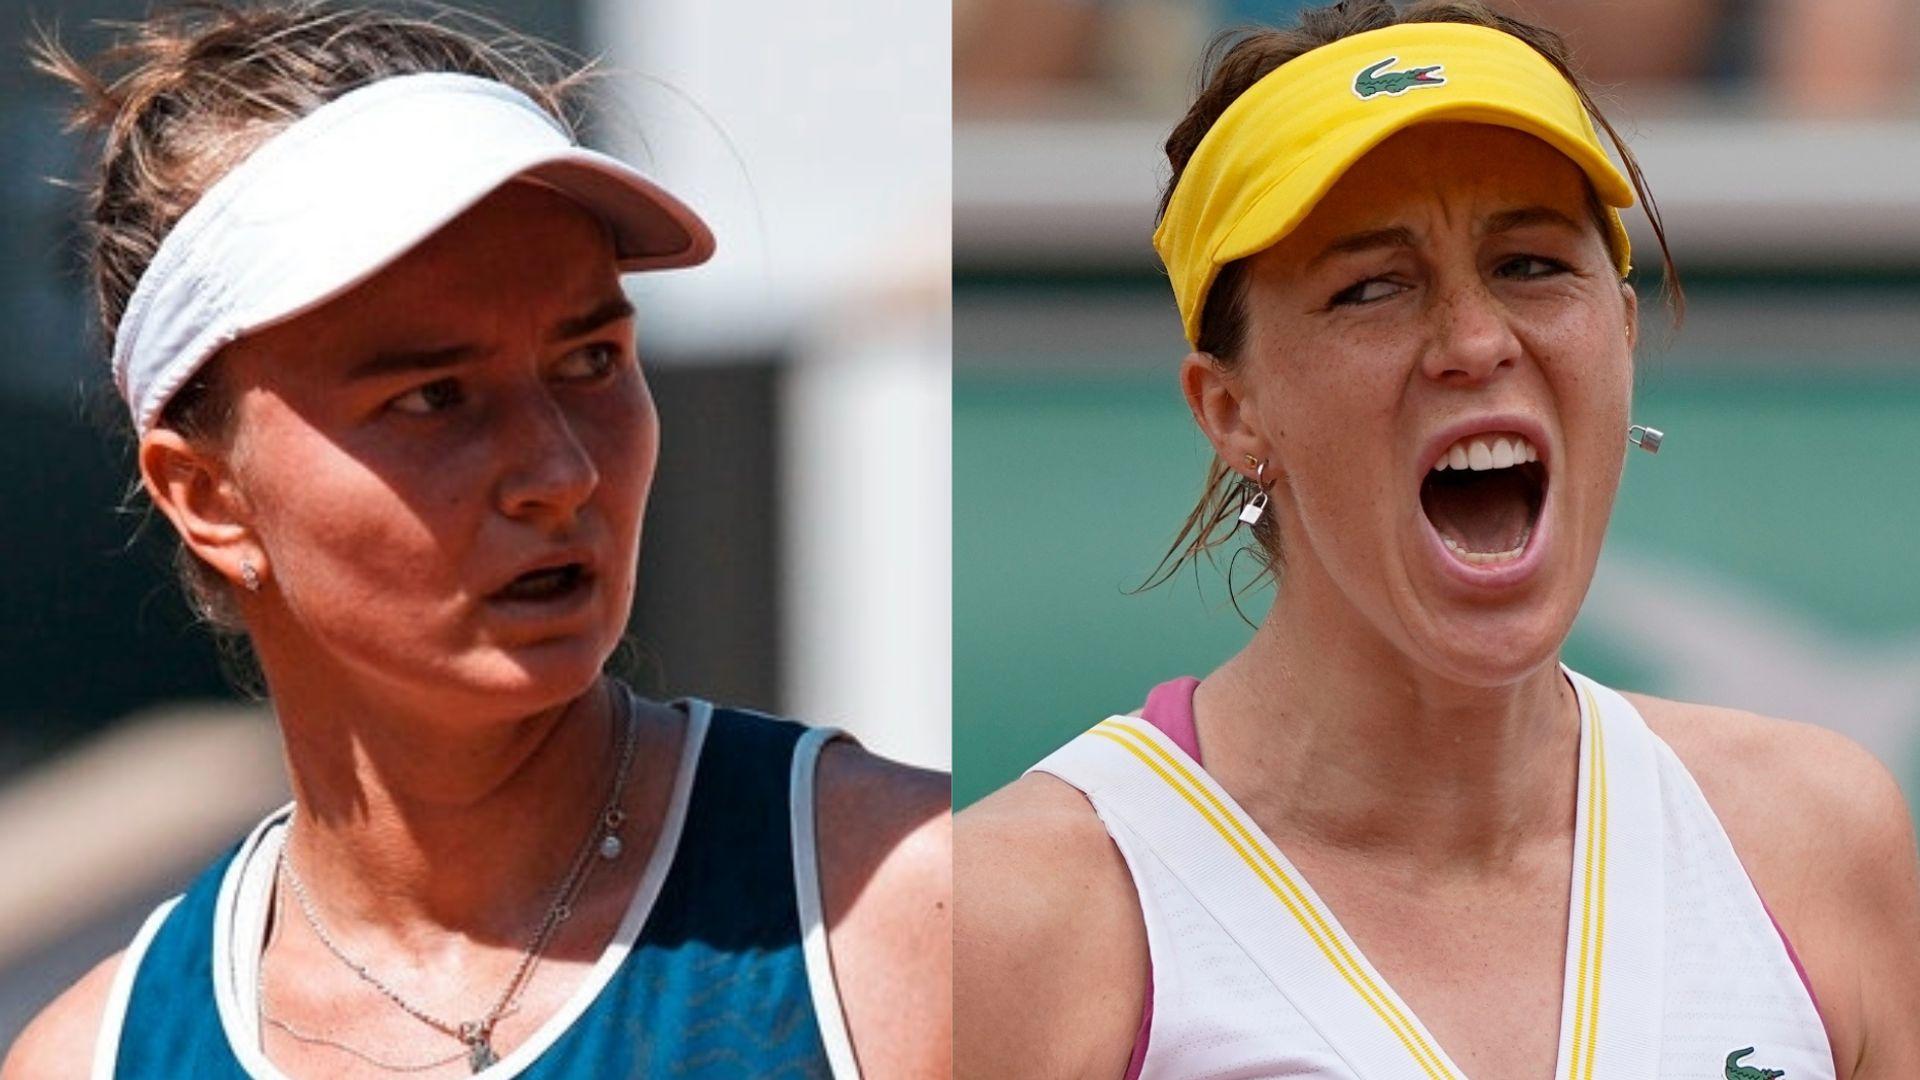 French Open final of firsts for Krejcikova and Pavlyuchenkova